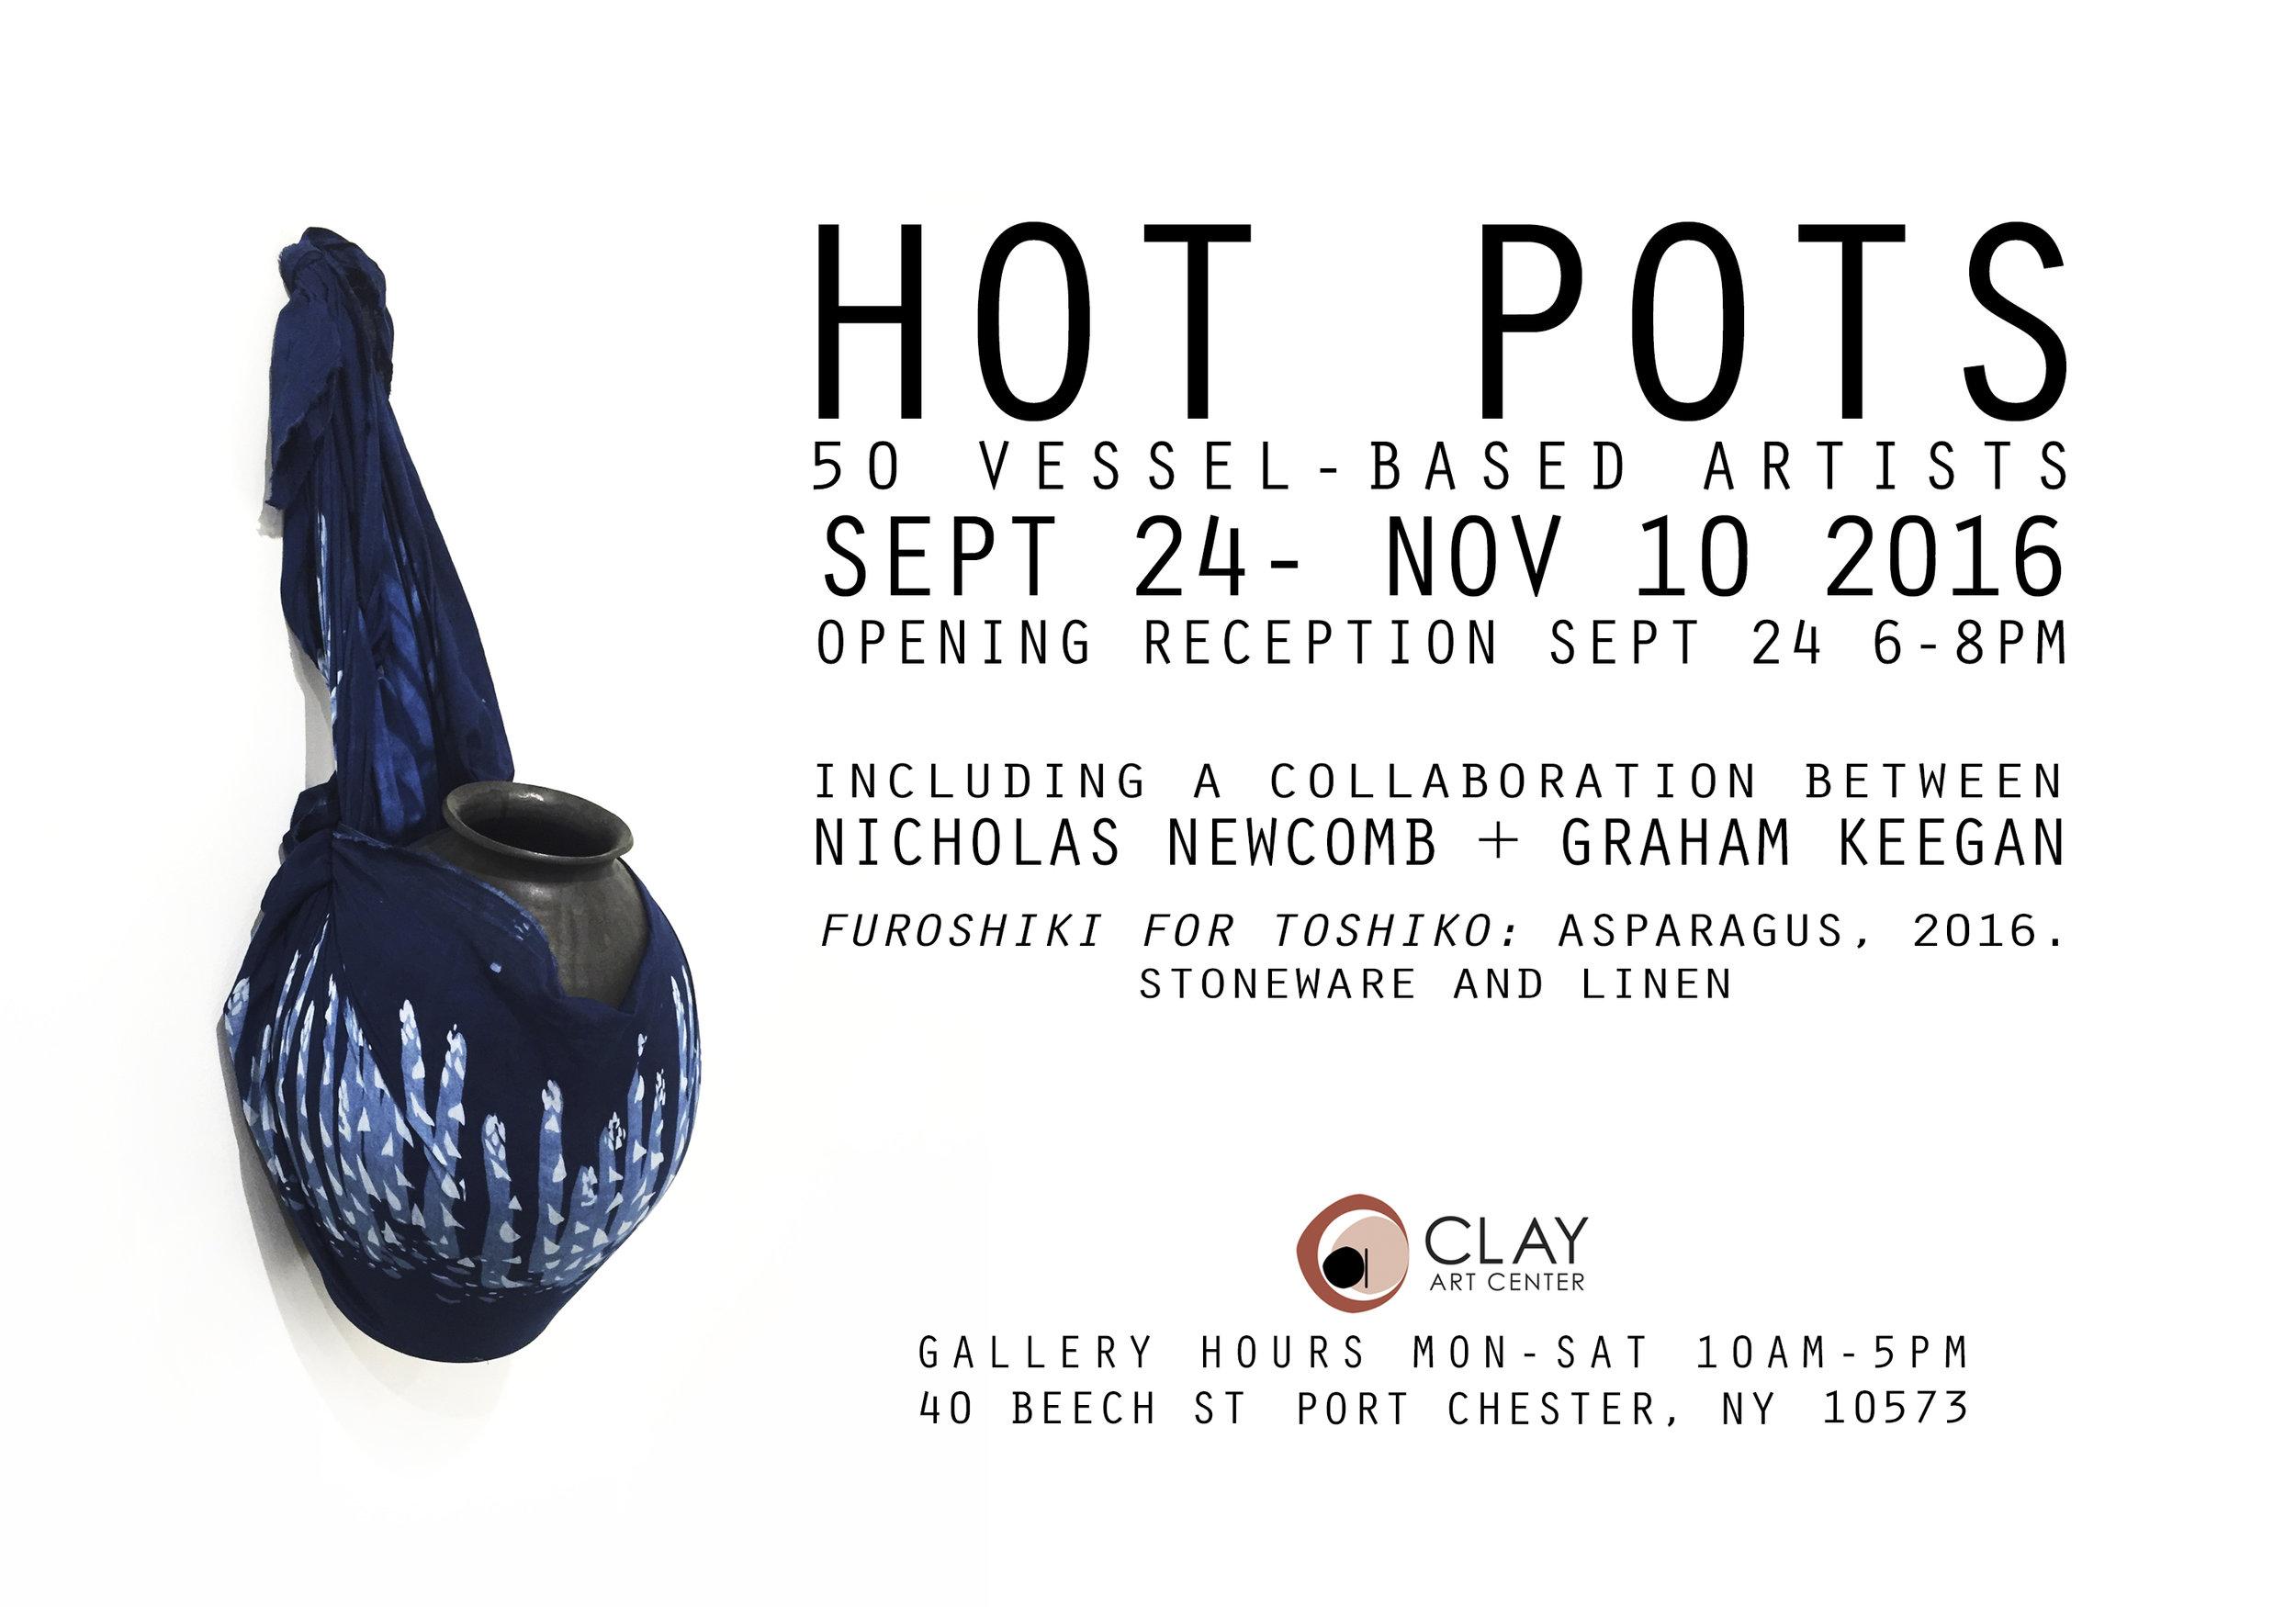 Hot Pots Exhibition